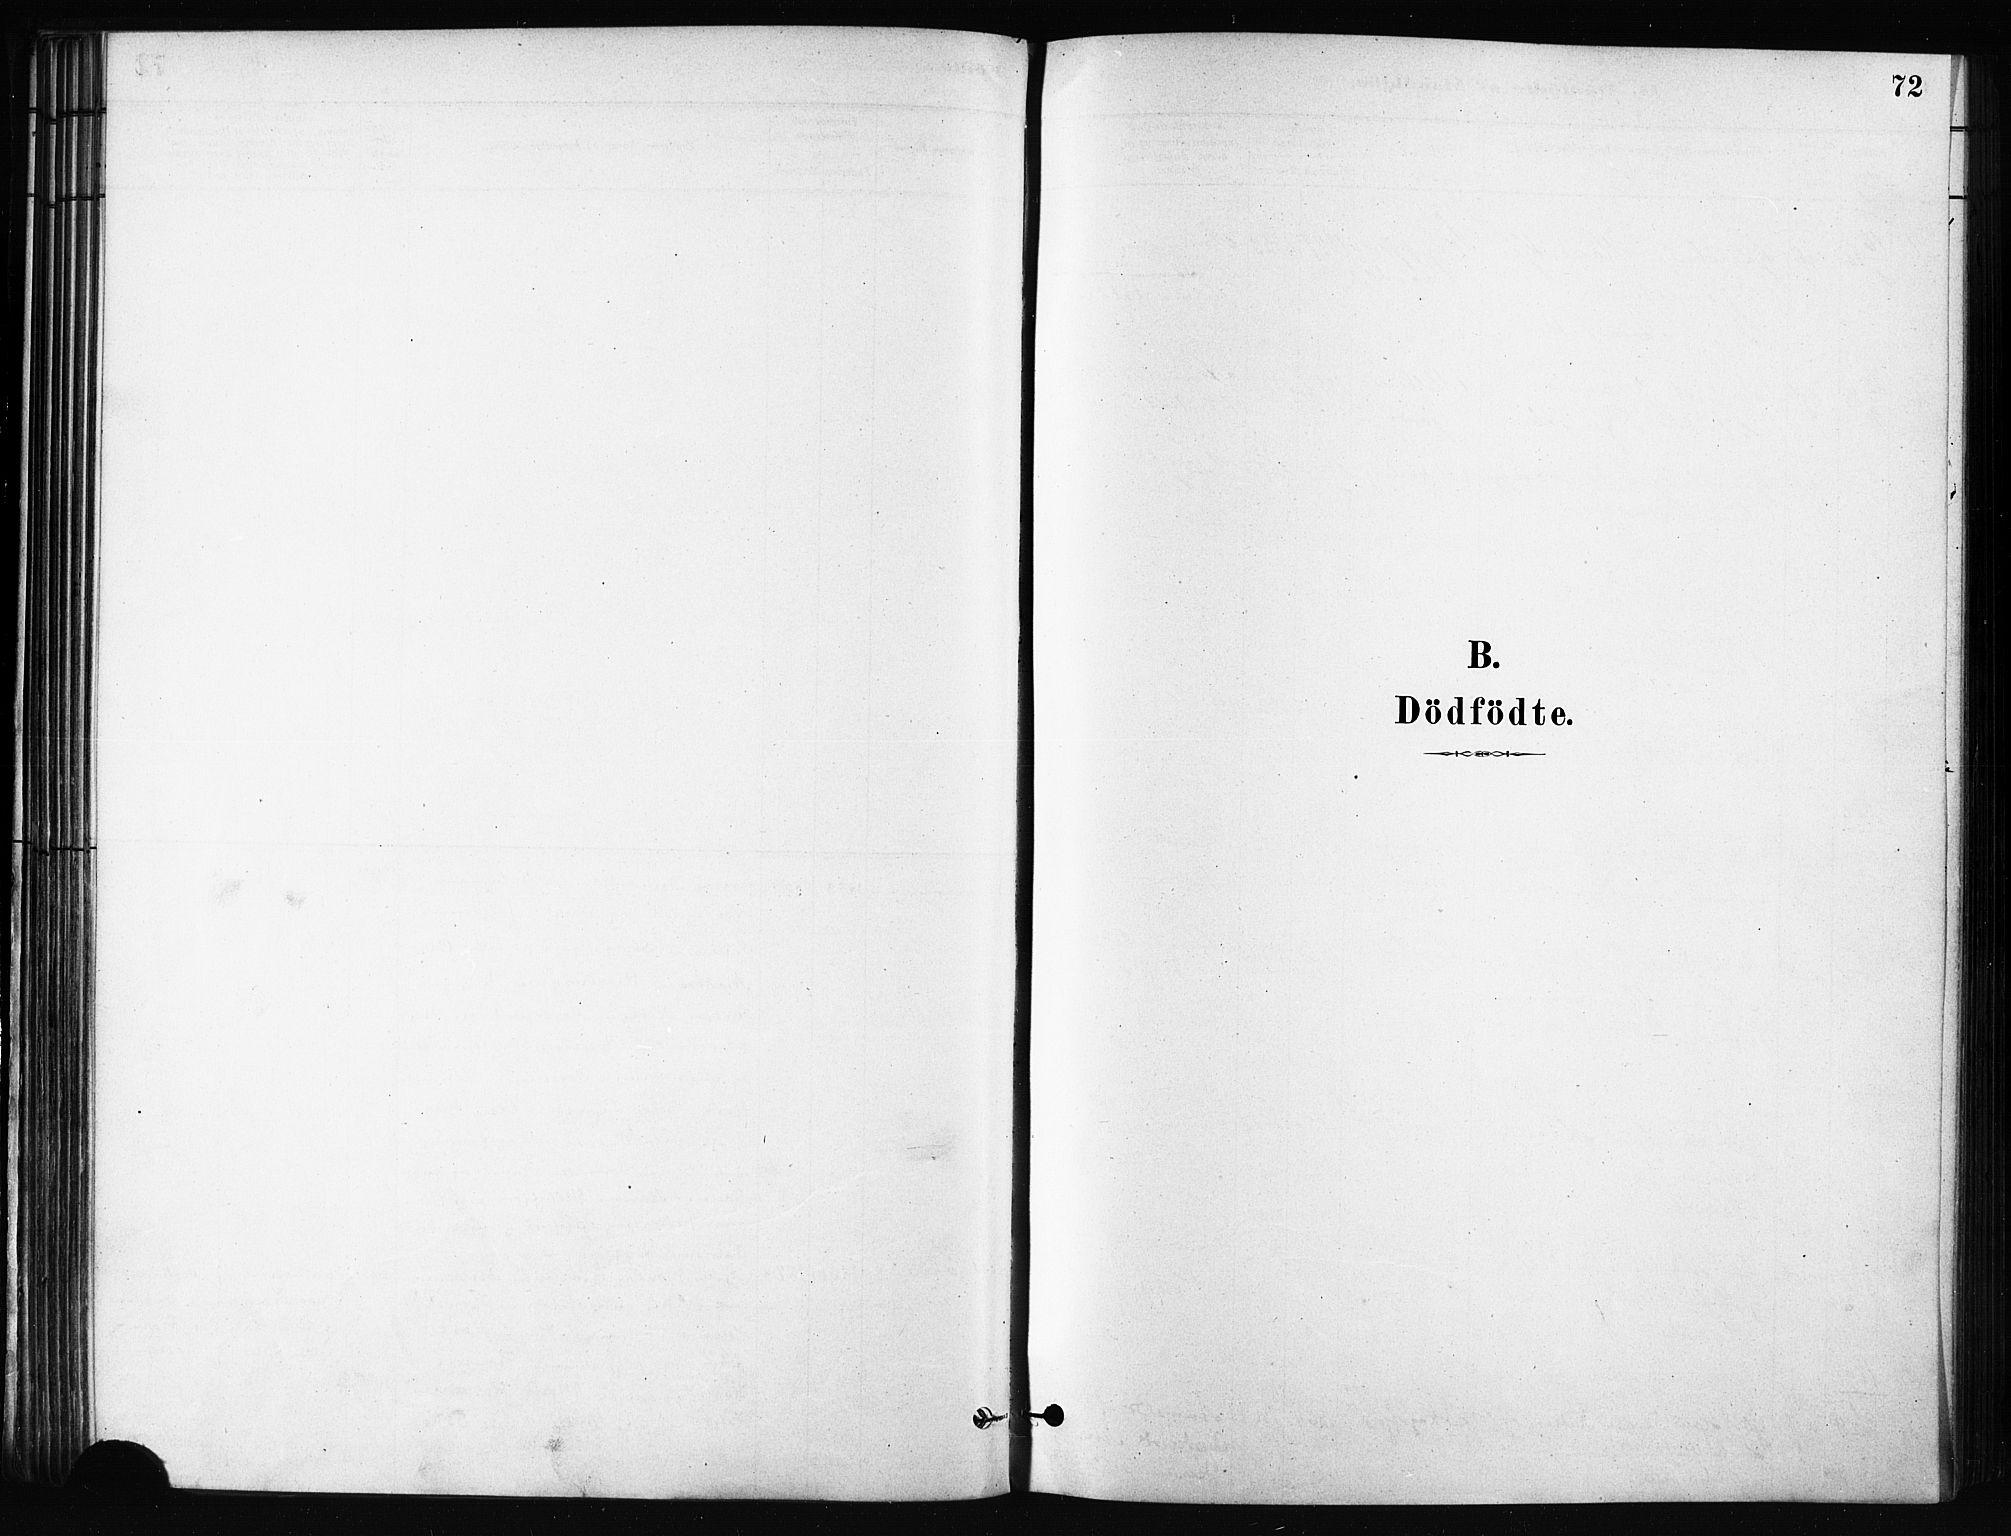 SATØ, Karlsøy sokneprestembete, H/Ha/Haa/L0011kirke: Ministerialbok nr. 11, 1879-1892, s. 72